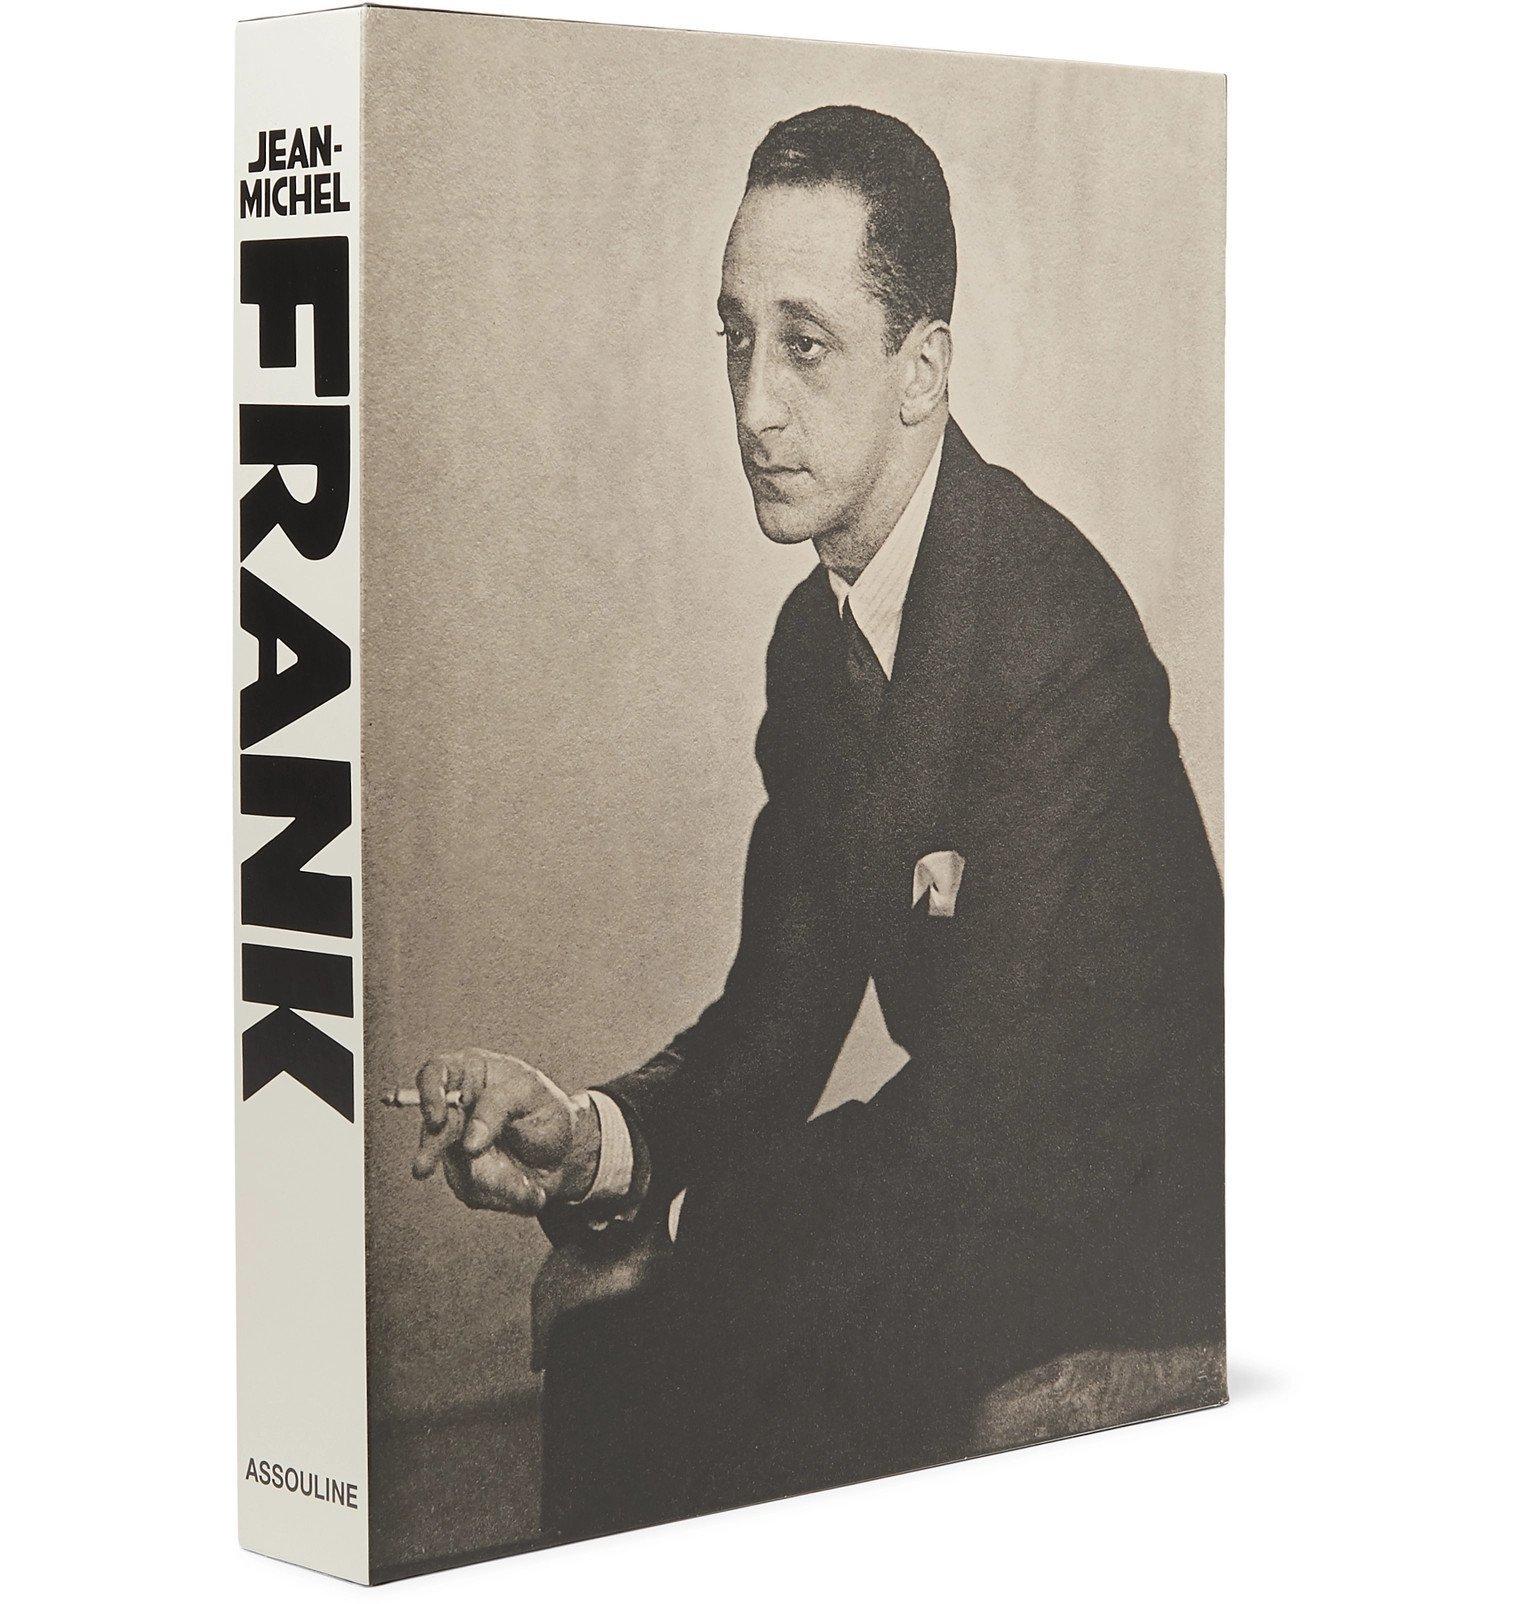 Photo: Assouline - Jean-Michel Frank Hardcover Book - White